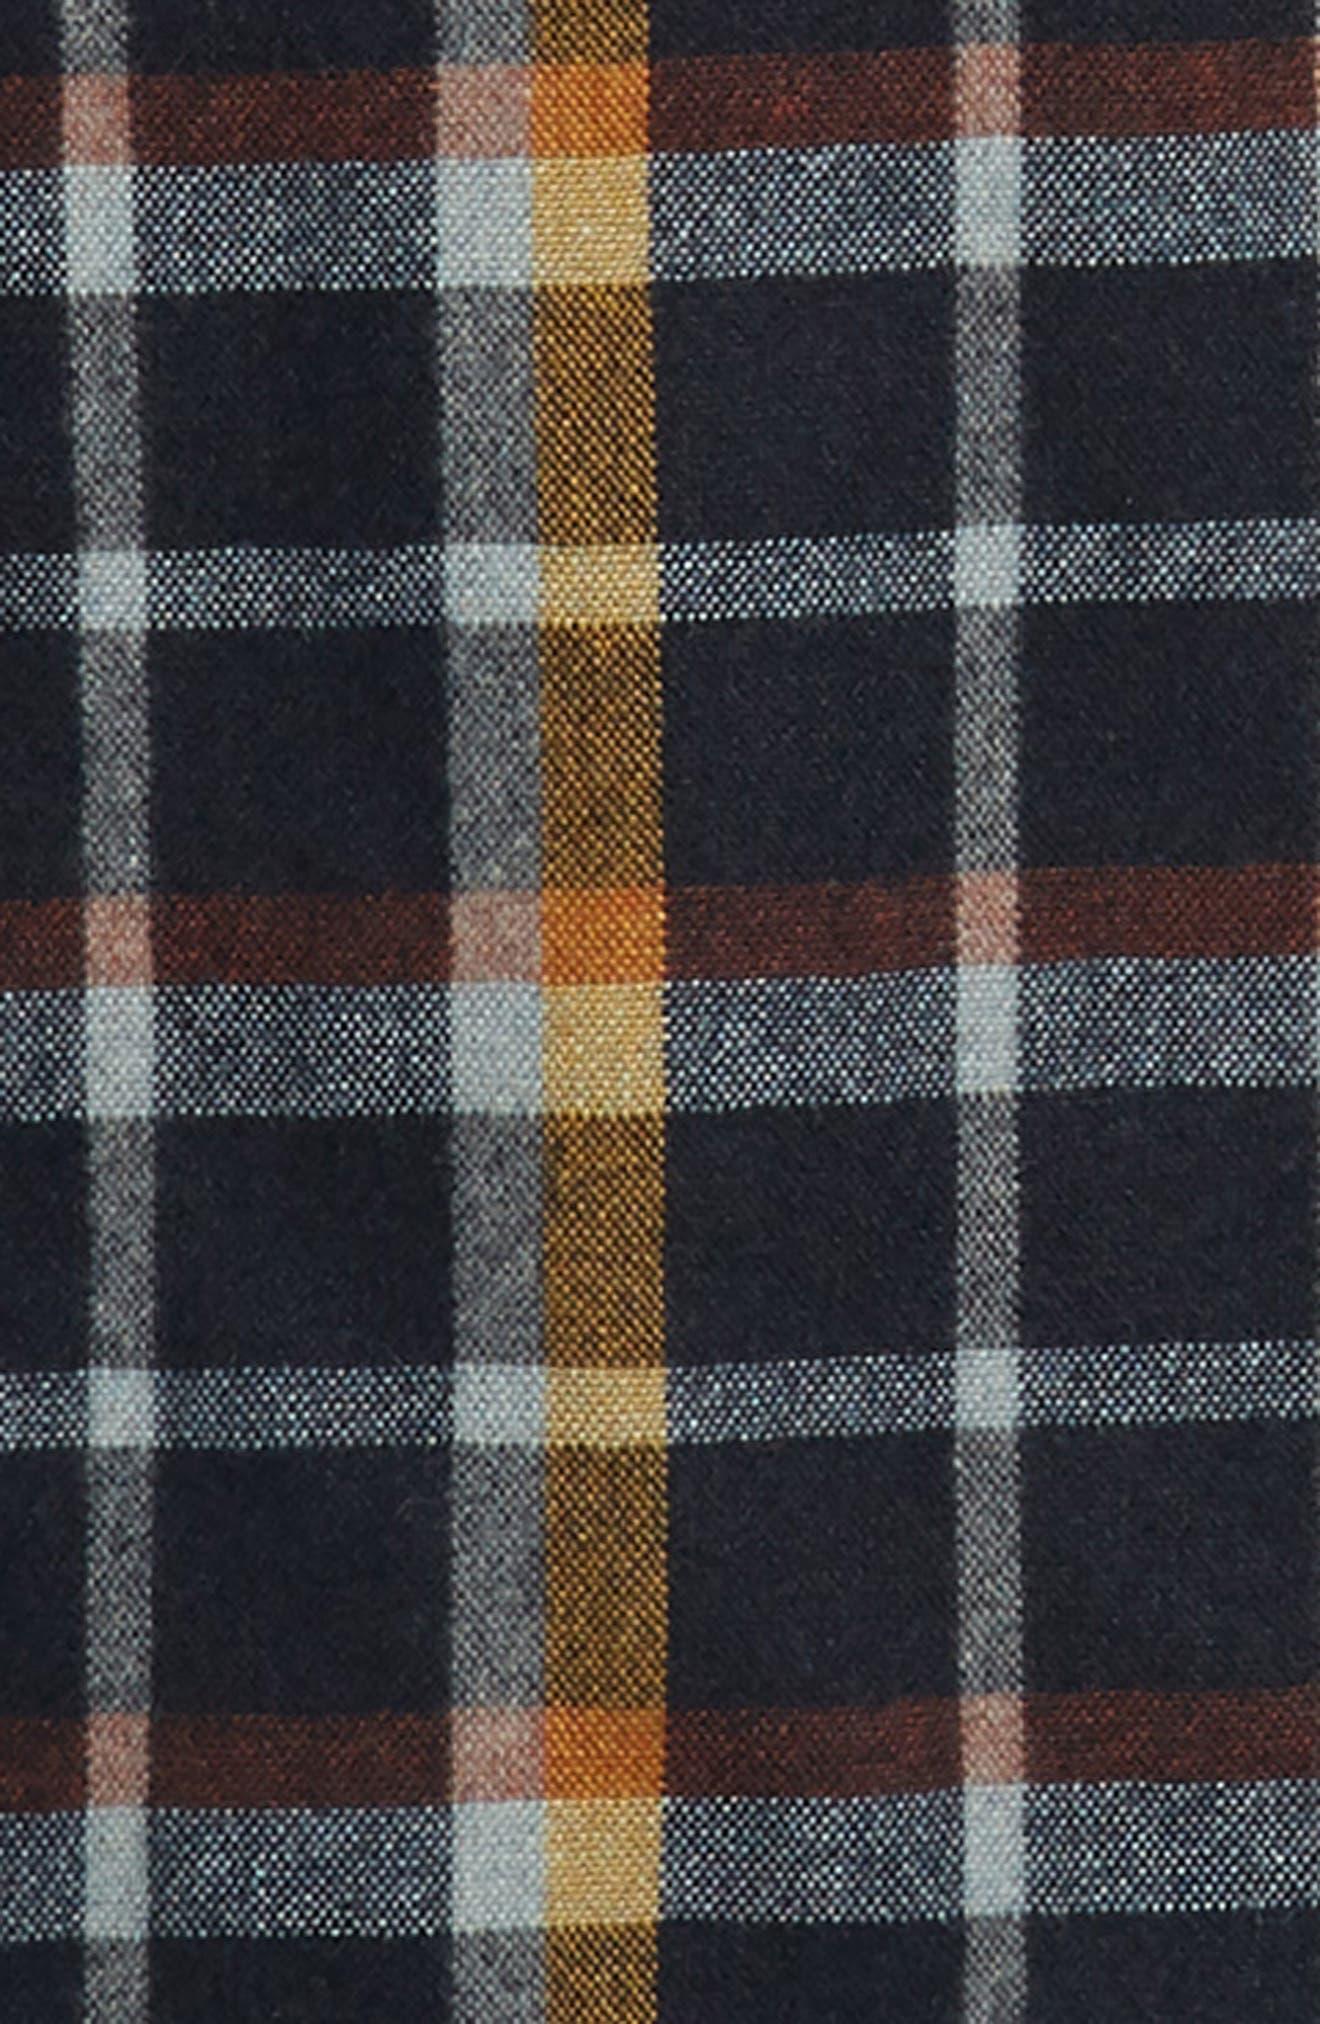 Recycled Wool Blend Shirt,                             Alternate thumbnail 6, color,                             REBEL PLAID/ NAVY BLUE